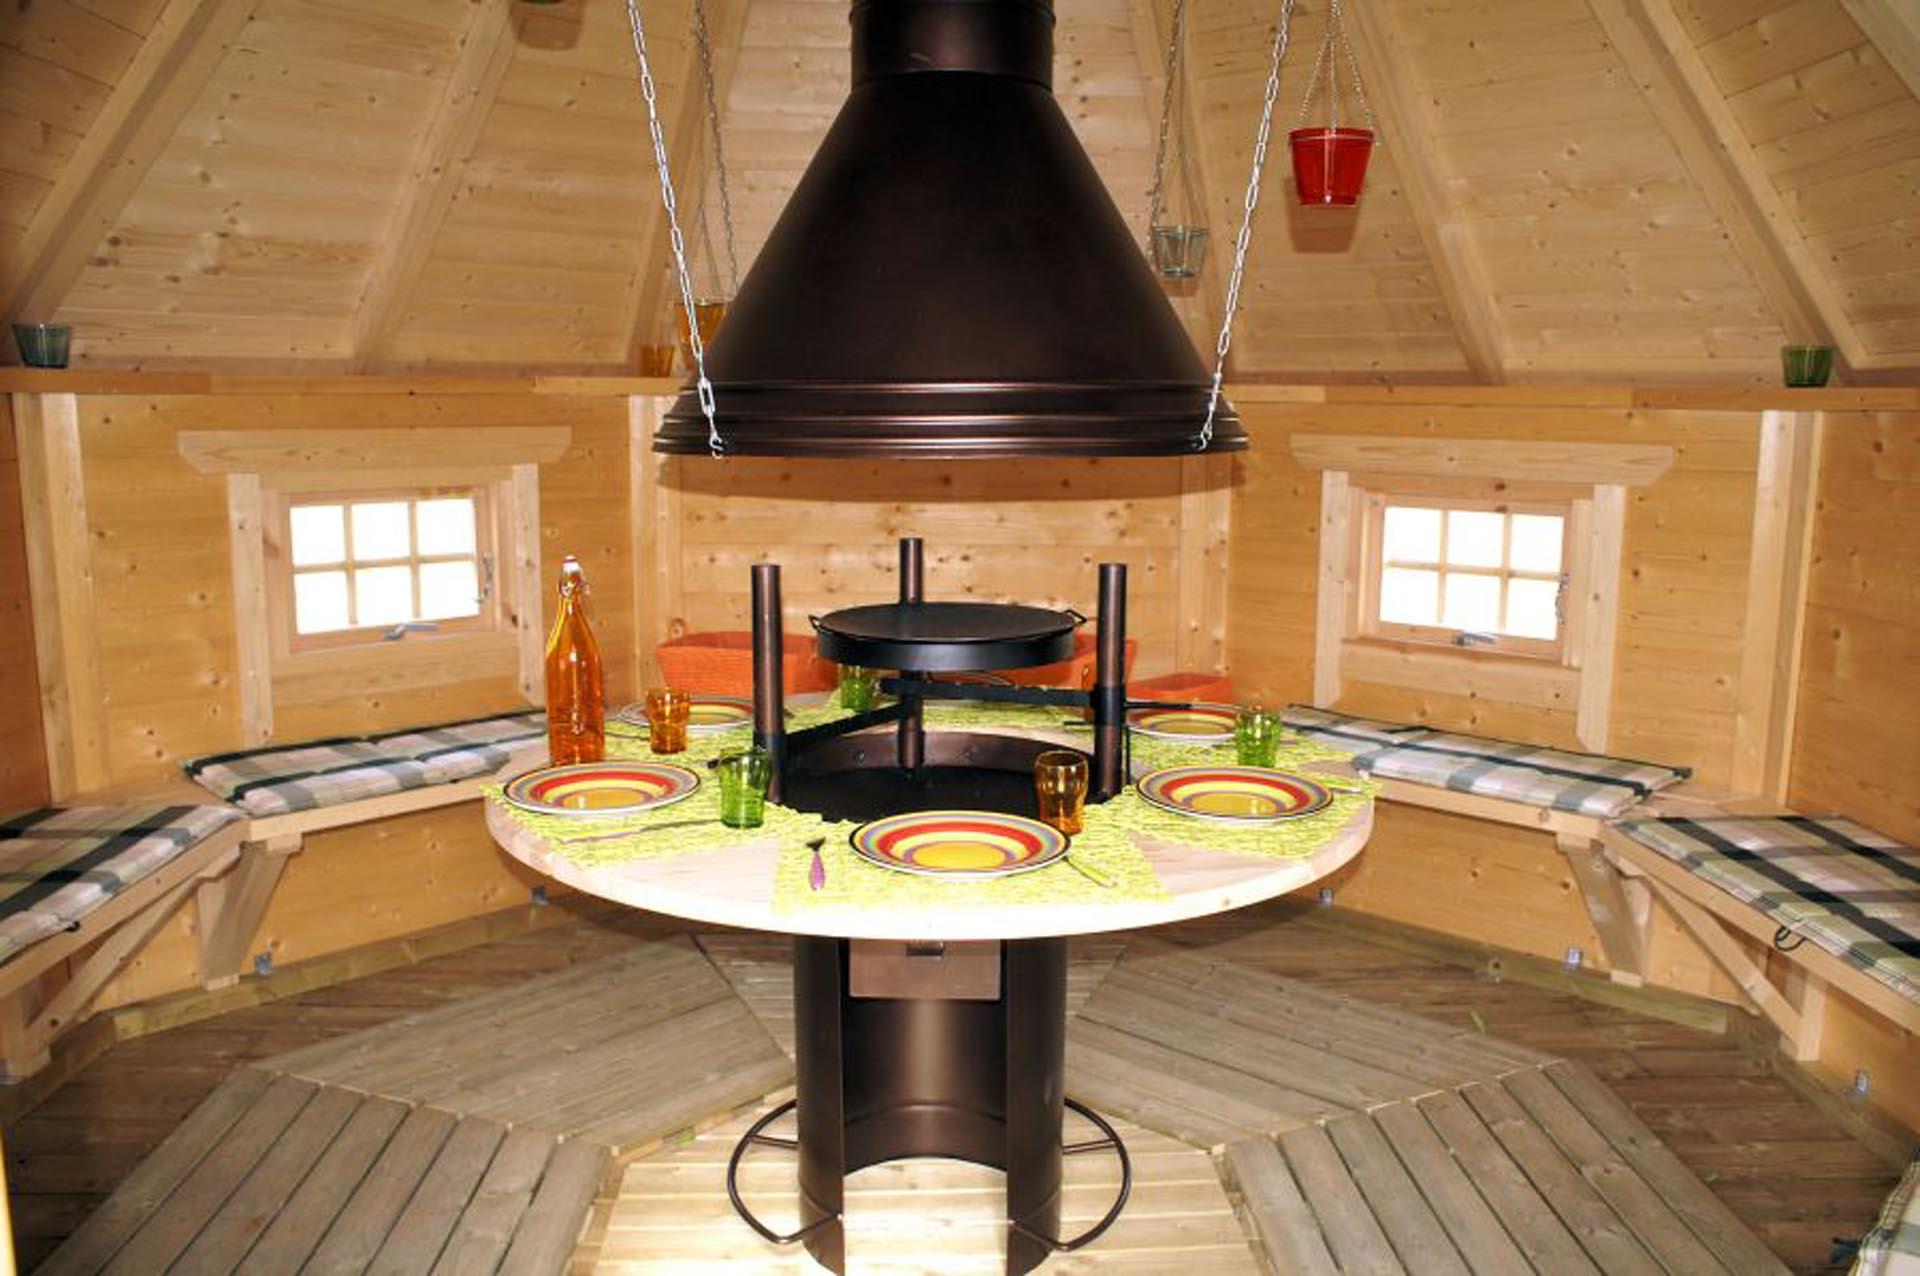 11 4 m2 grill hytte 2 - Party gartenhaus ...